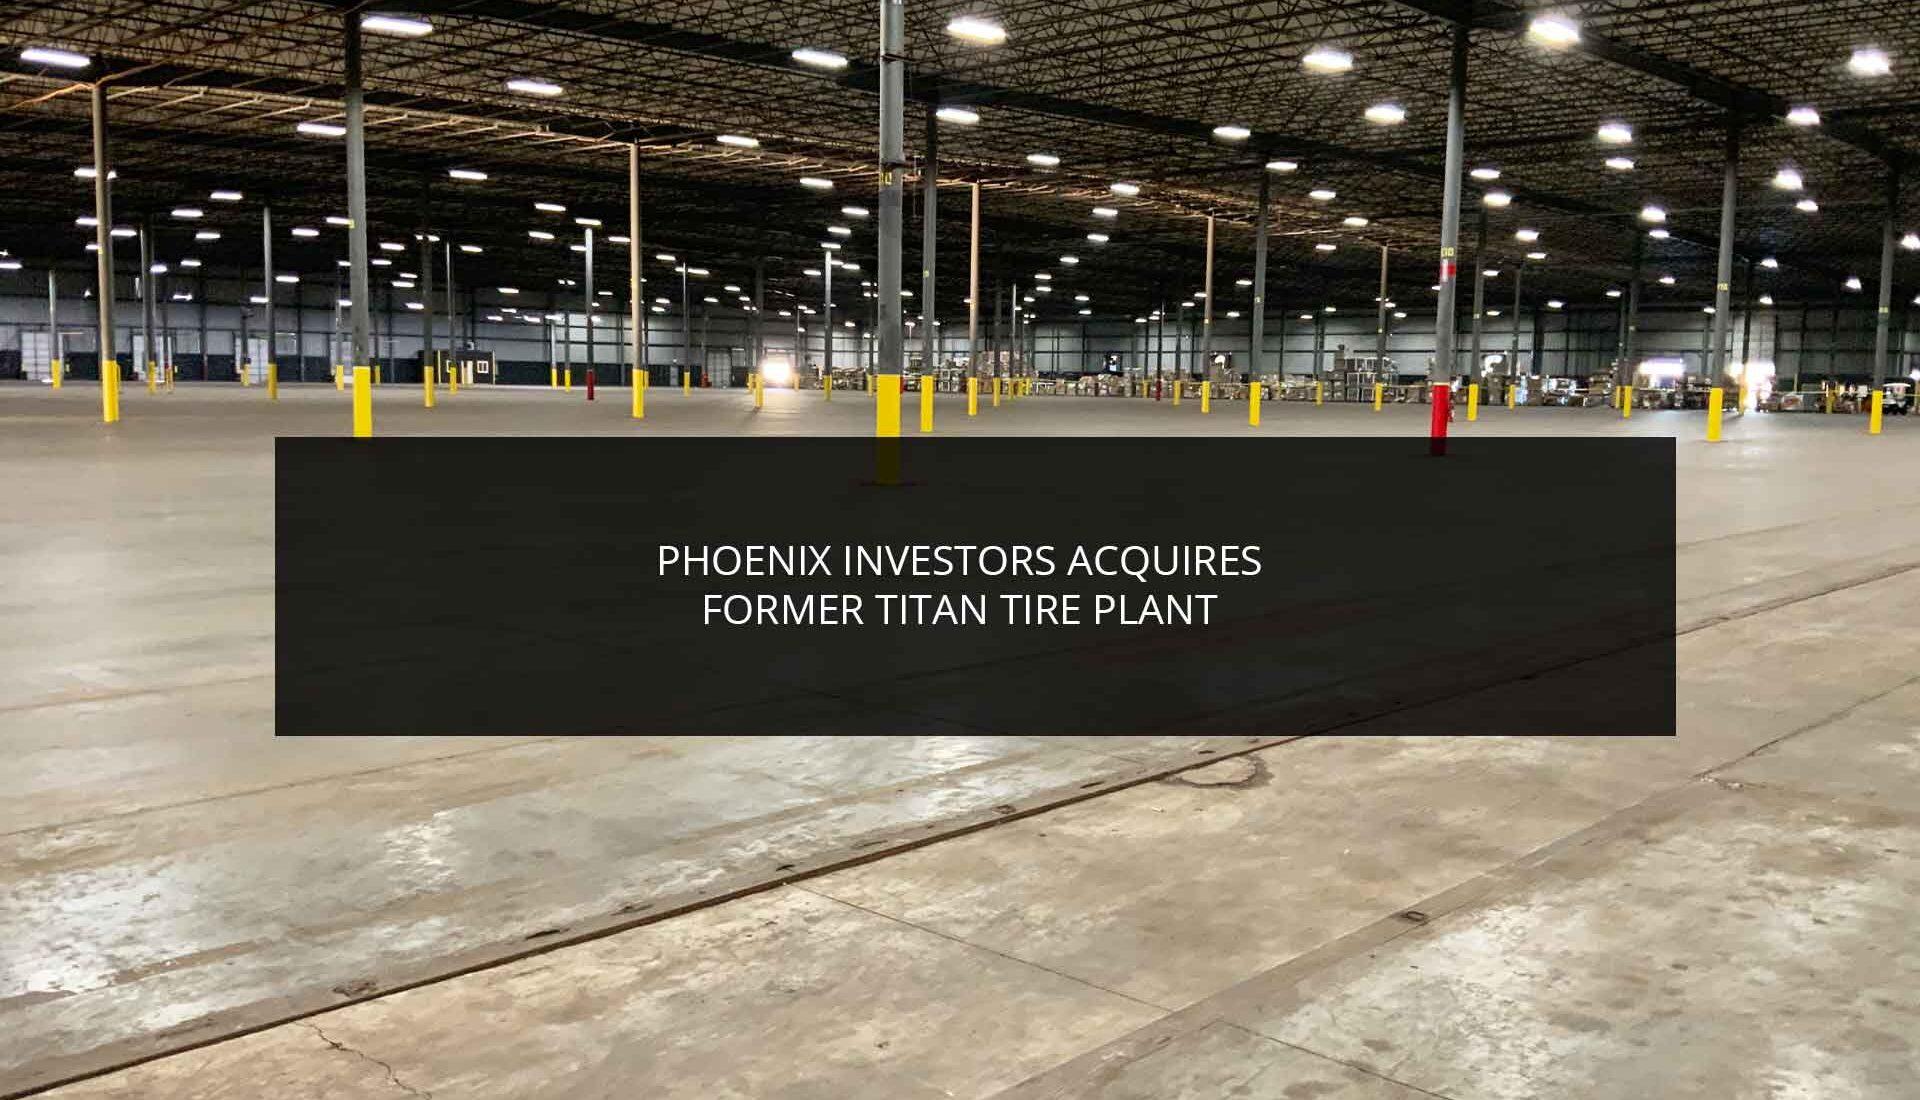 Phoenix Investors Acquires Former Titan Tire Plant